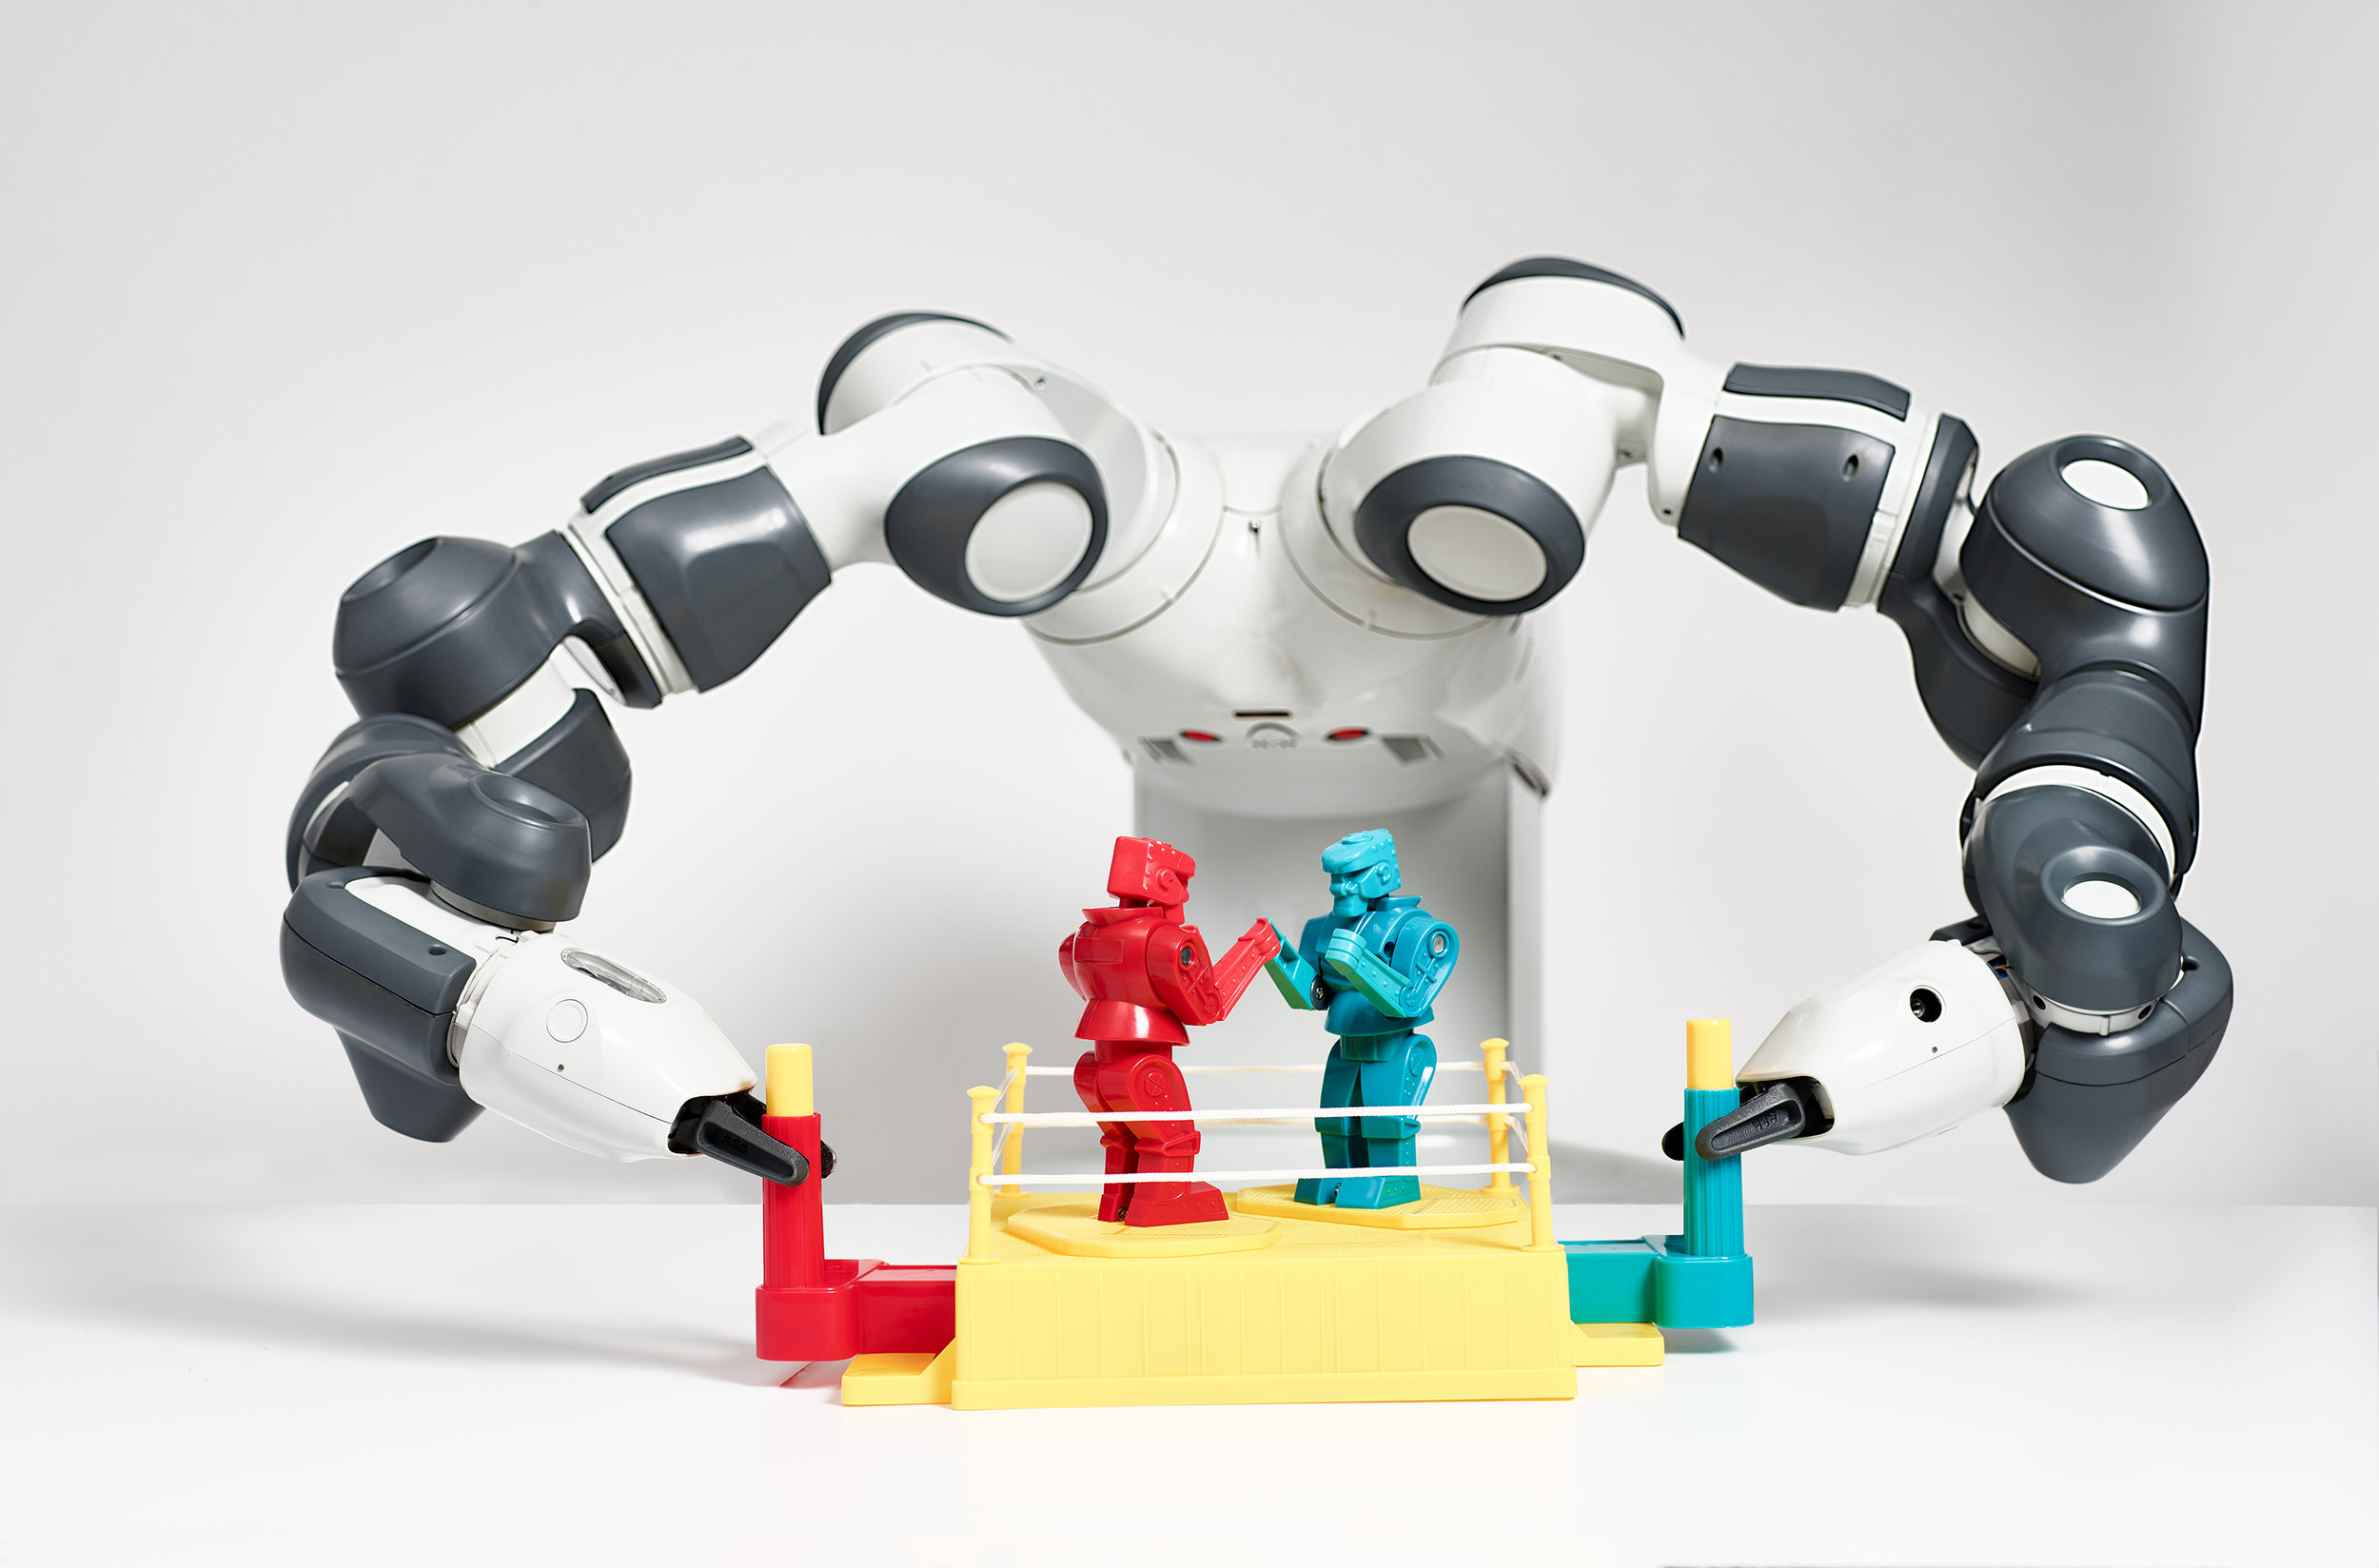 Jordan_Reeder_Vicarious_Robot.jpg